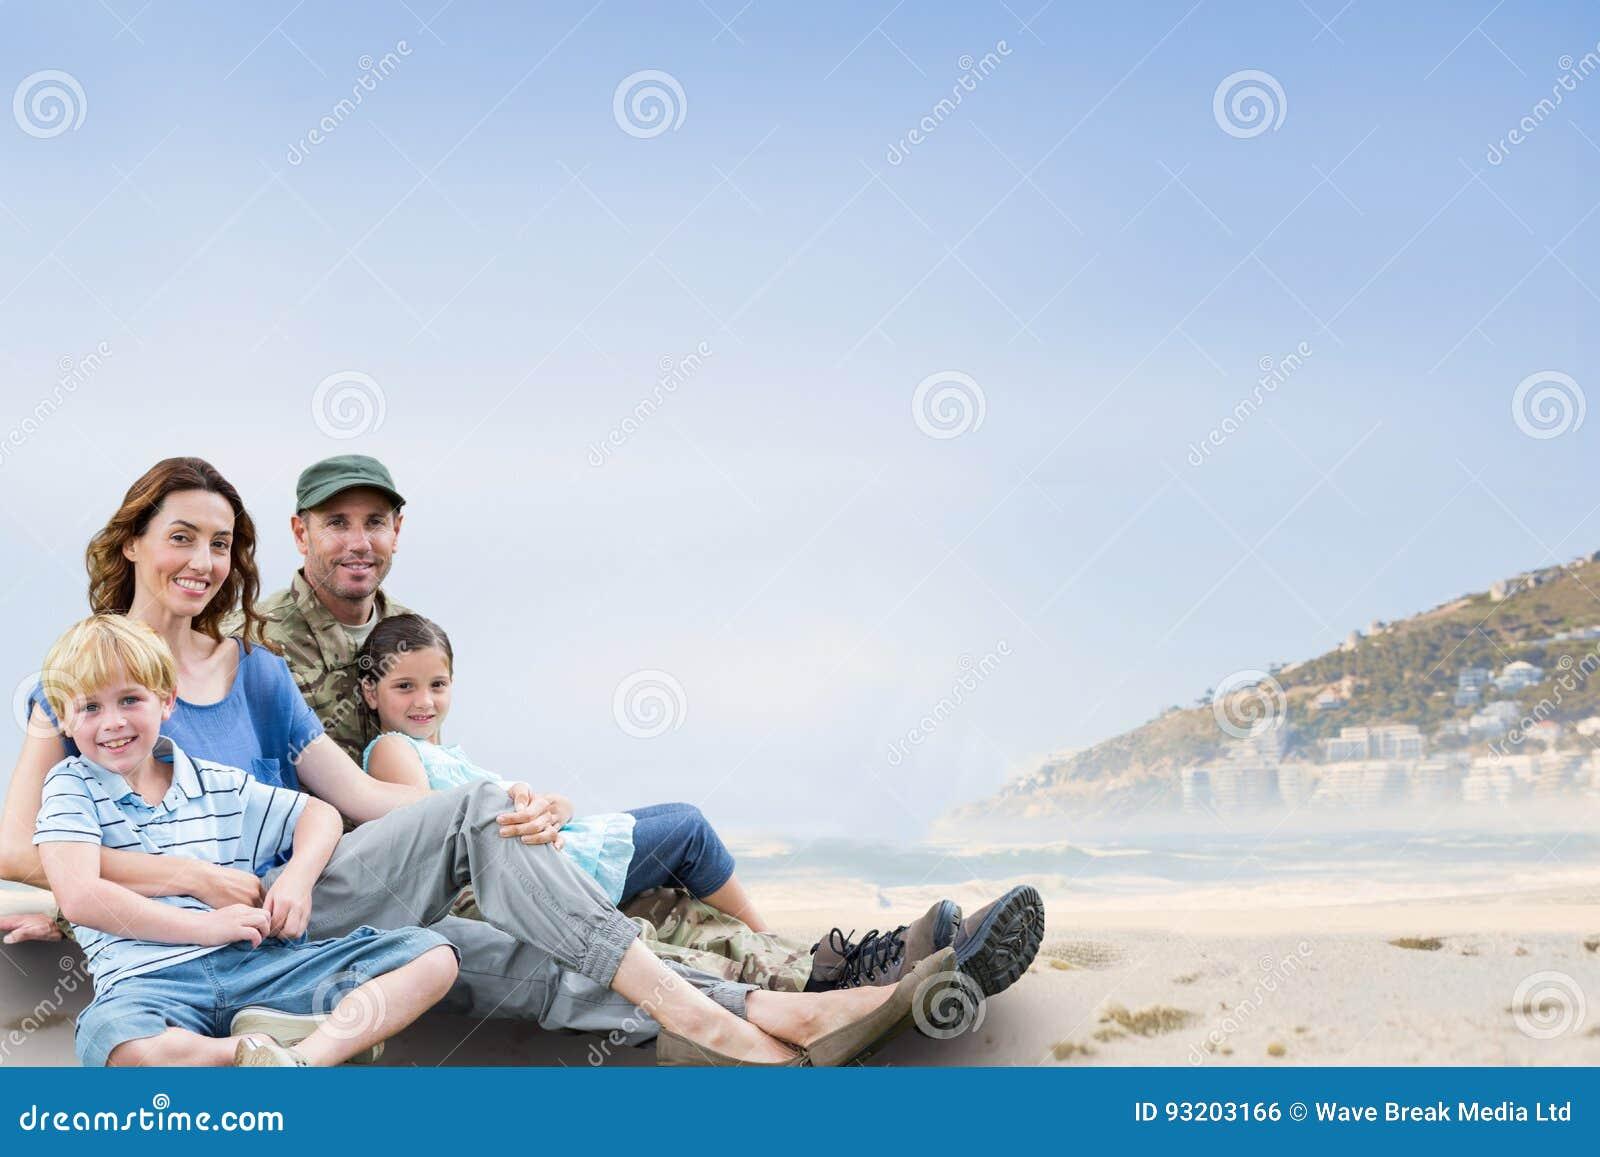 Family sitting on sand against coastline background